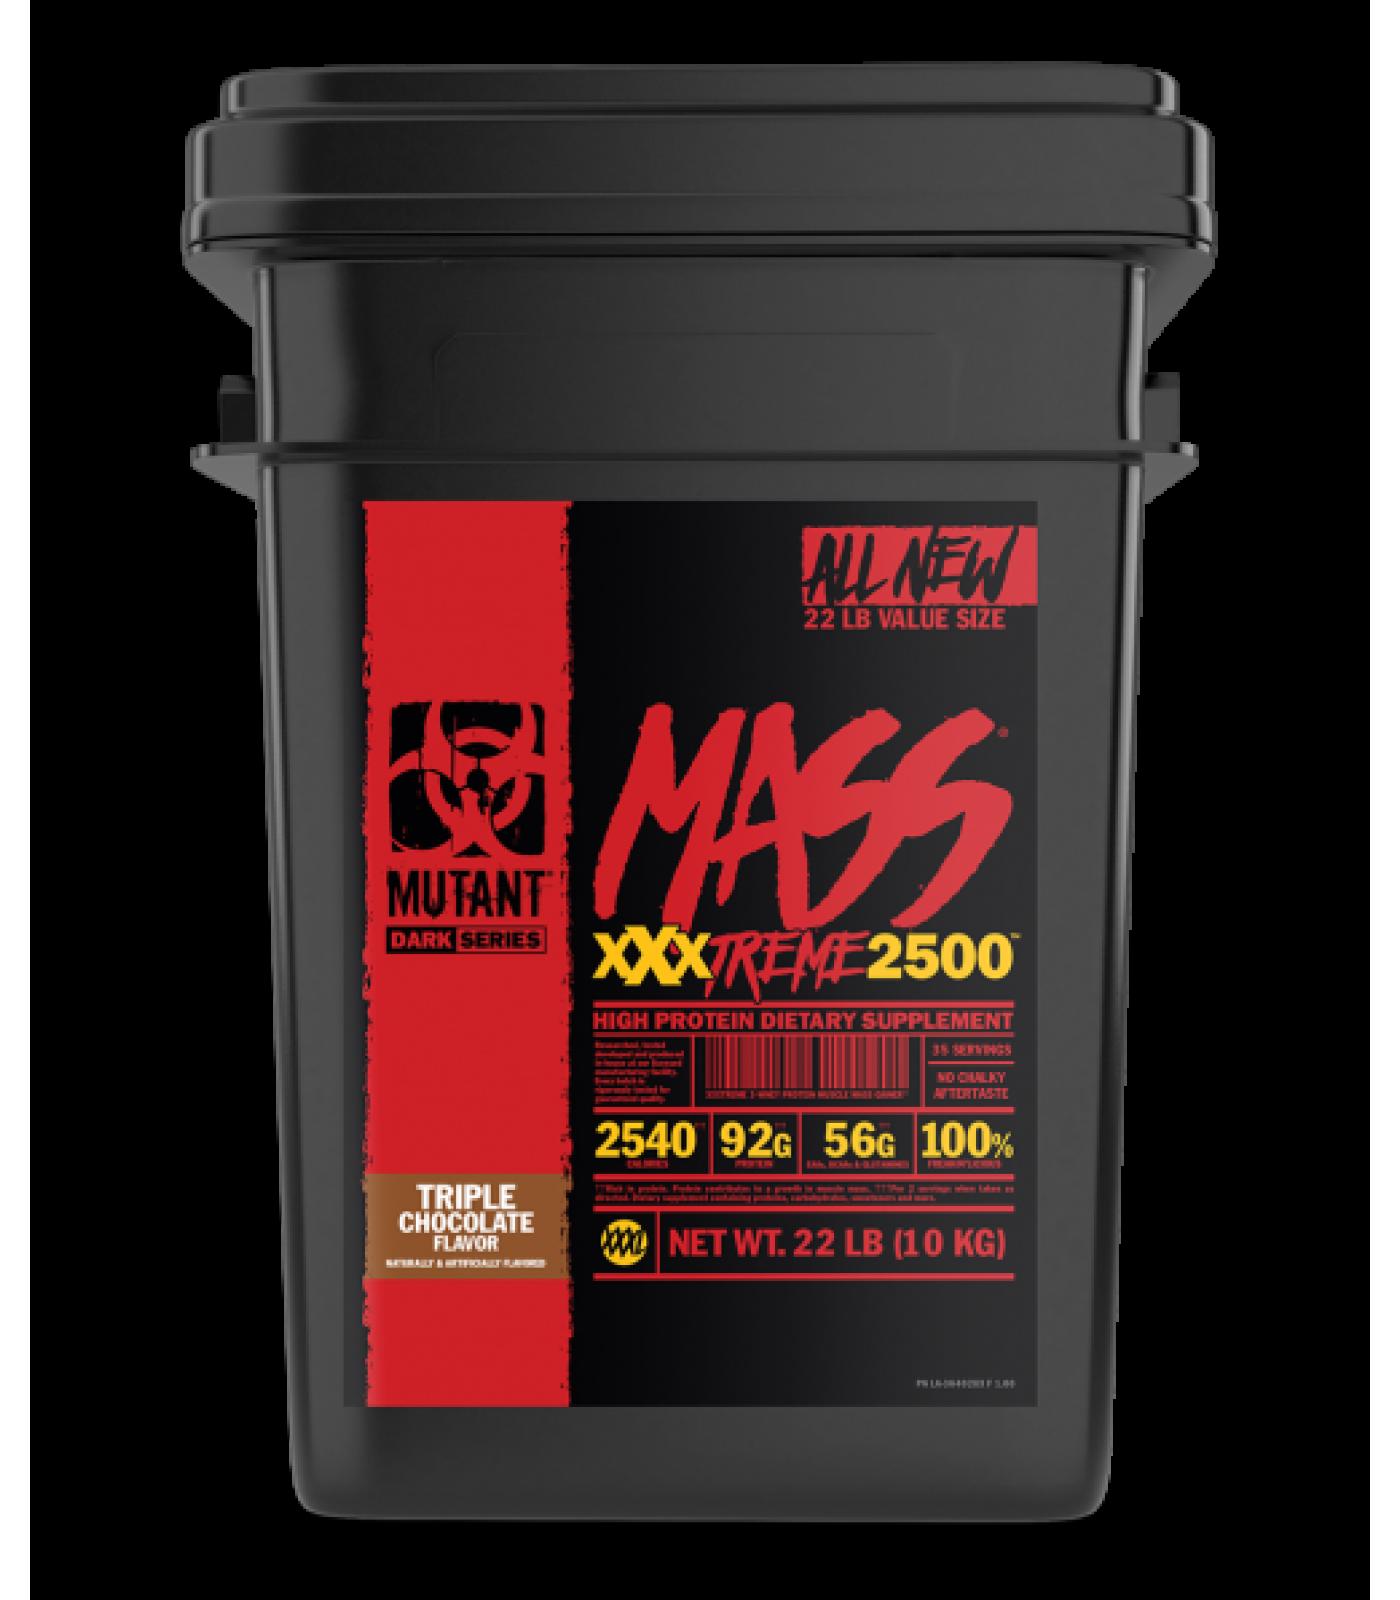 Mutant - MASS XXXTREME 2500 / 20lbs